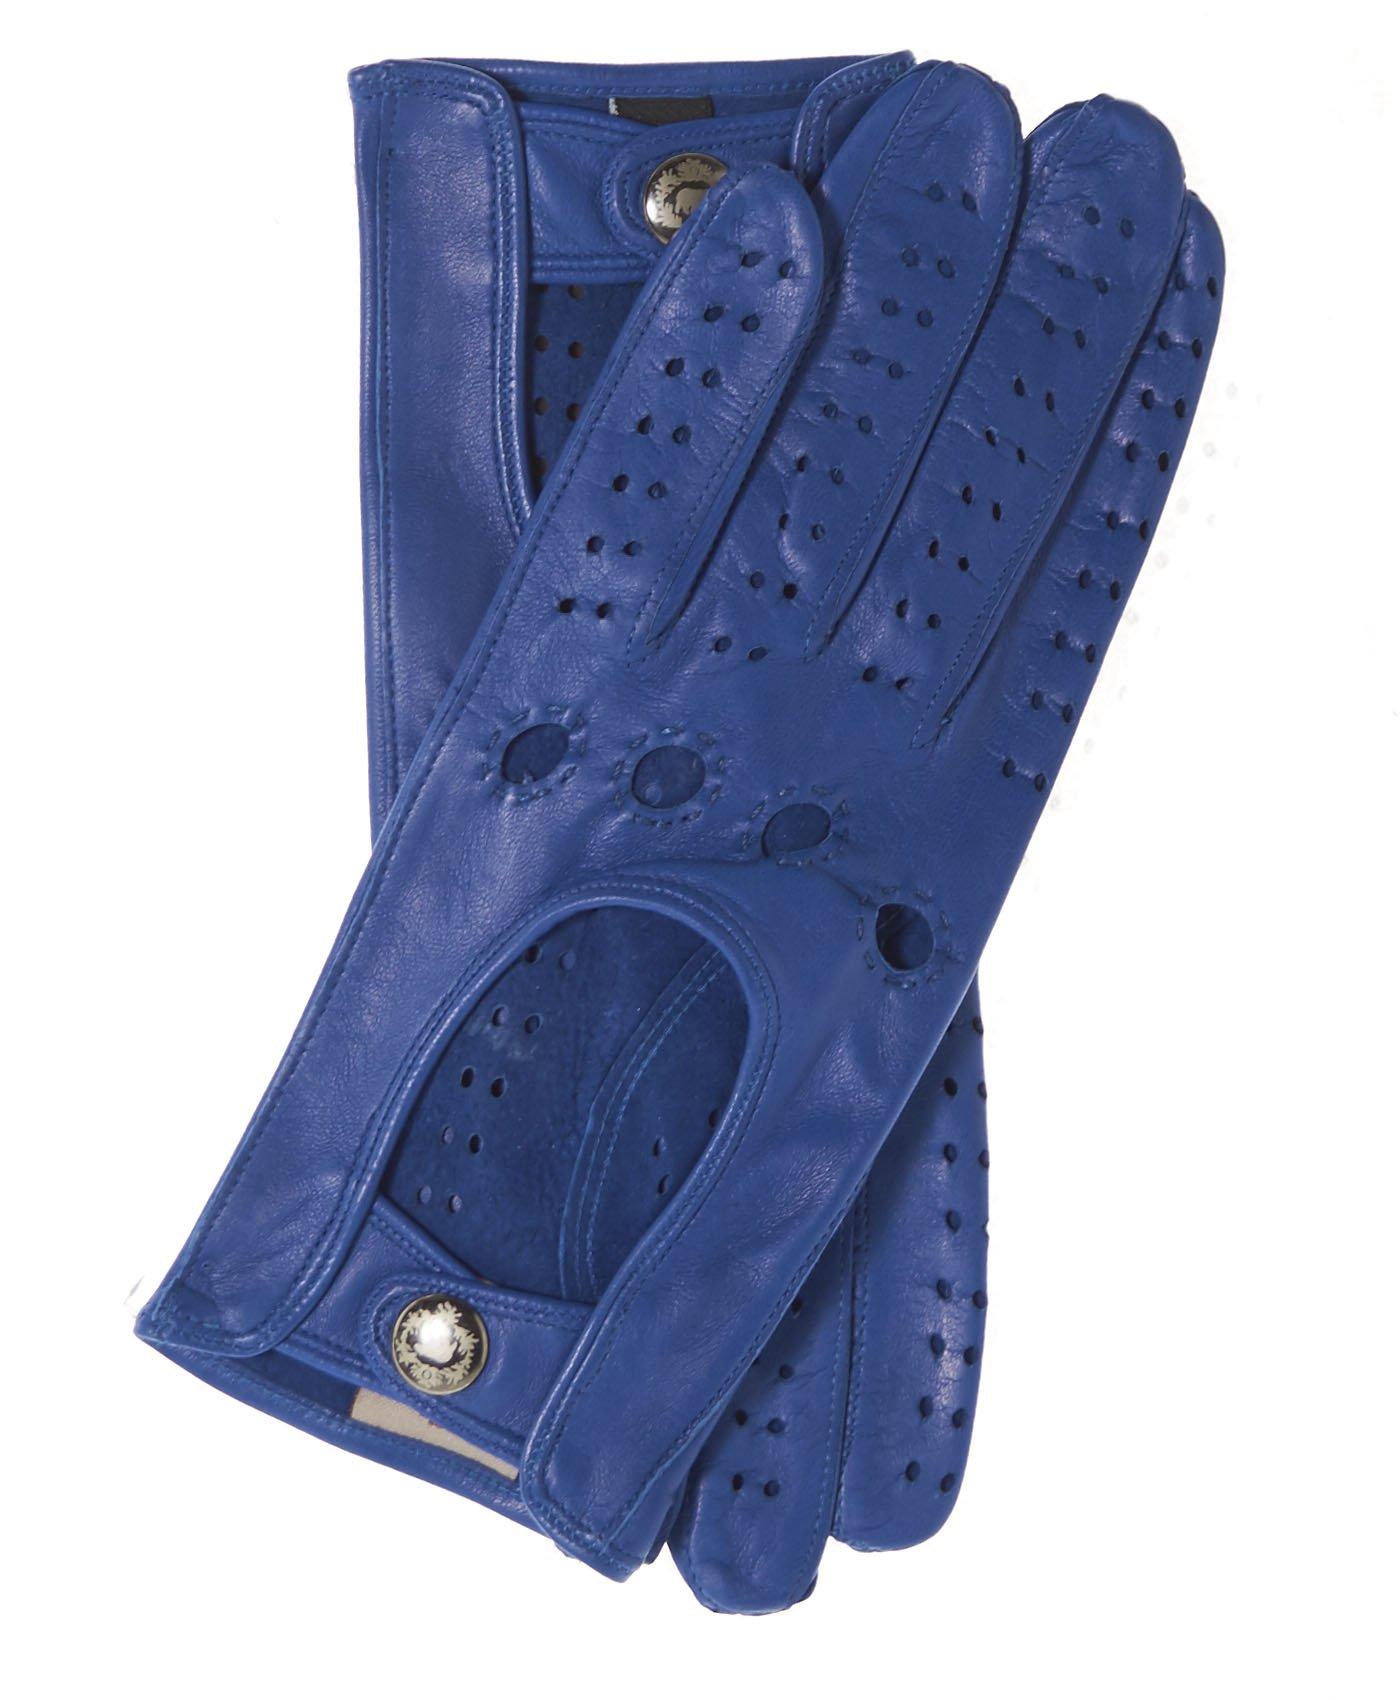 Fratelli Orsini Women's Italian Leather Driving Gloves Size 7 1/2 Color Blue